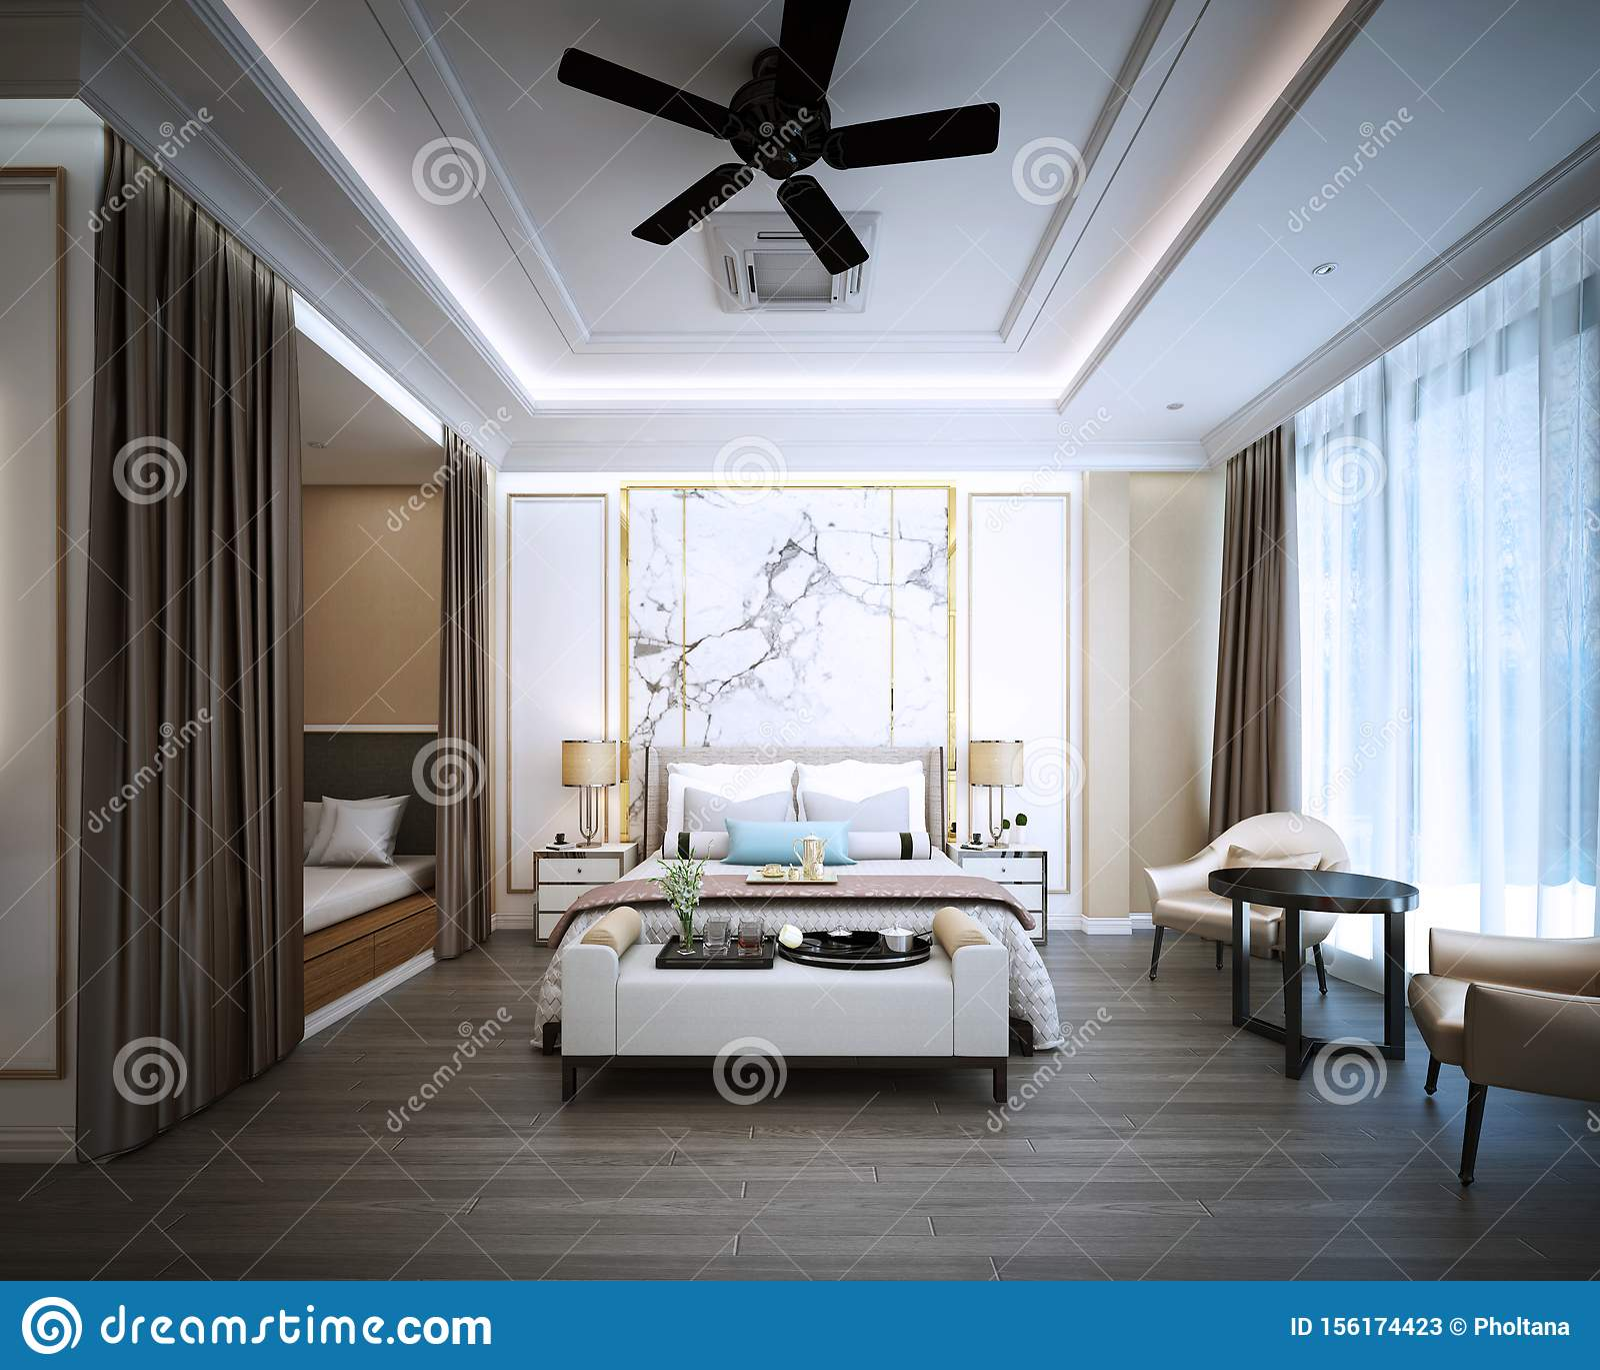 Bedroom Design Interior Of Modern Classic Style Stock Illustration Illustration Of Area Dining 156174423